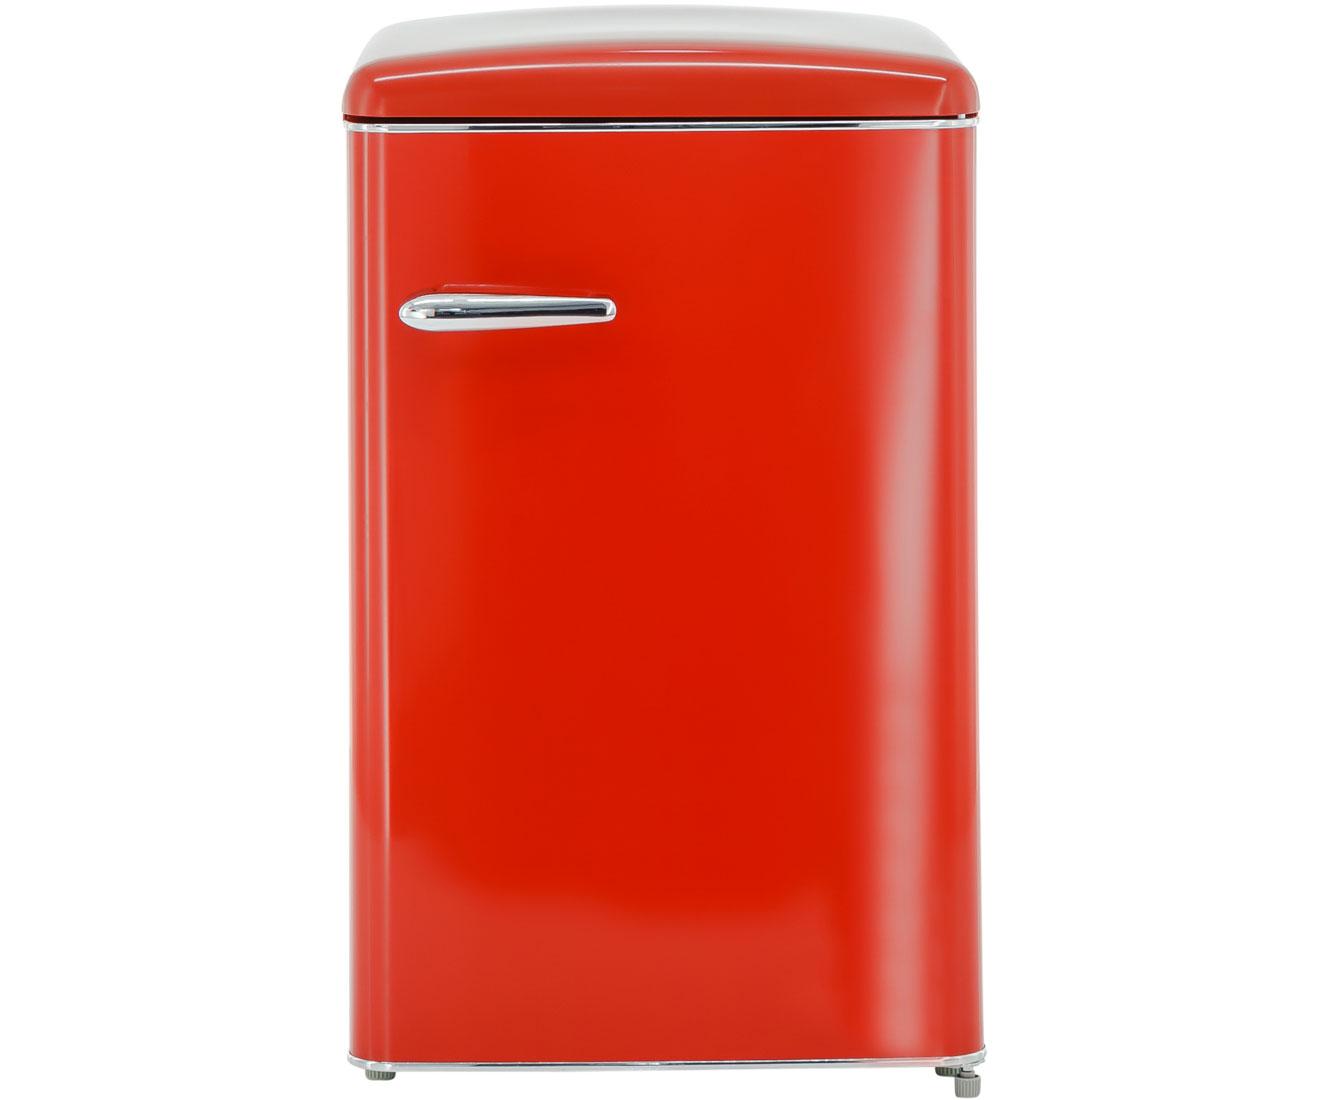 Kühlschrank Nostalgie : Nostalgie geräte